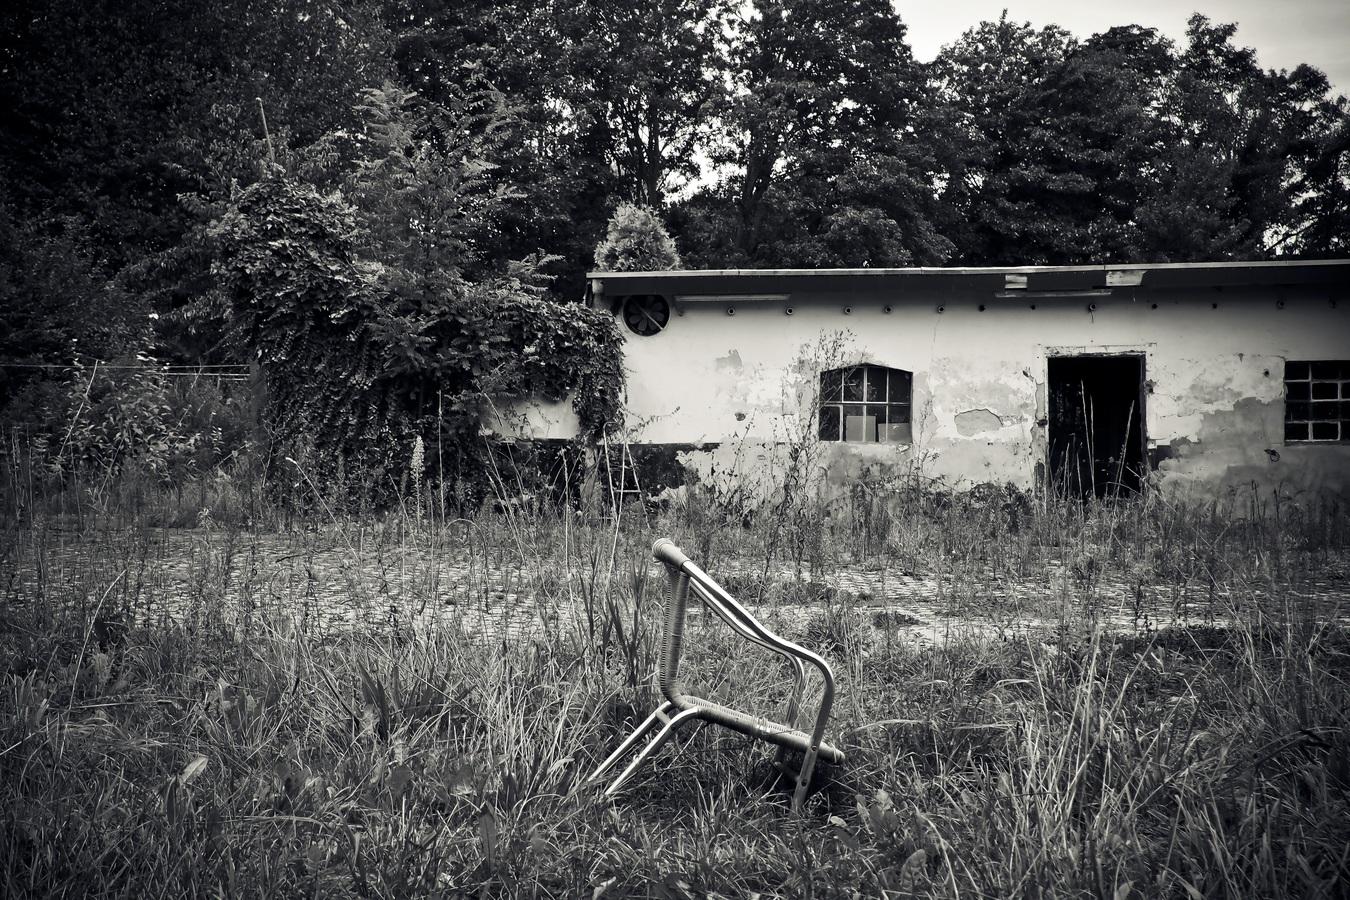 tree-grass-light-black-and-white-white-photography-786378-pxhere.com.jpg